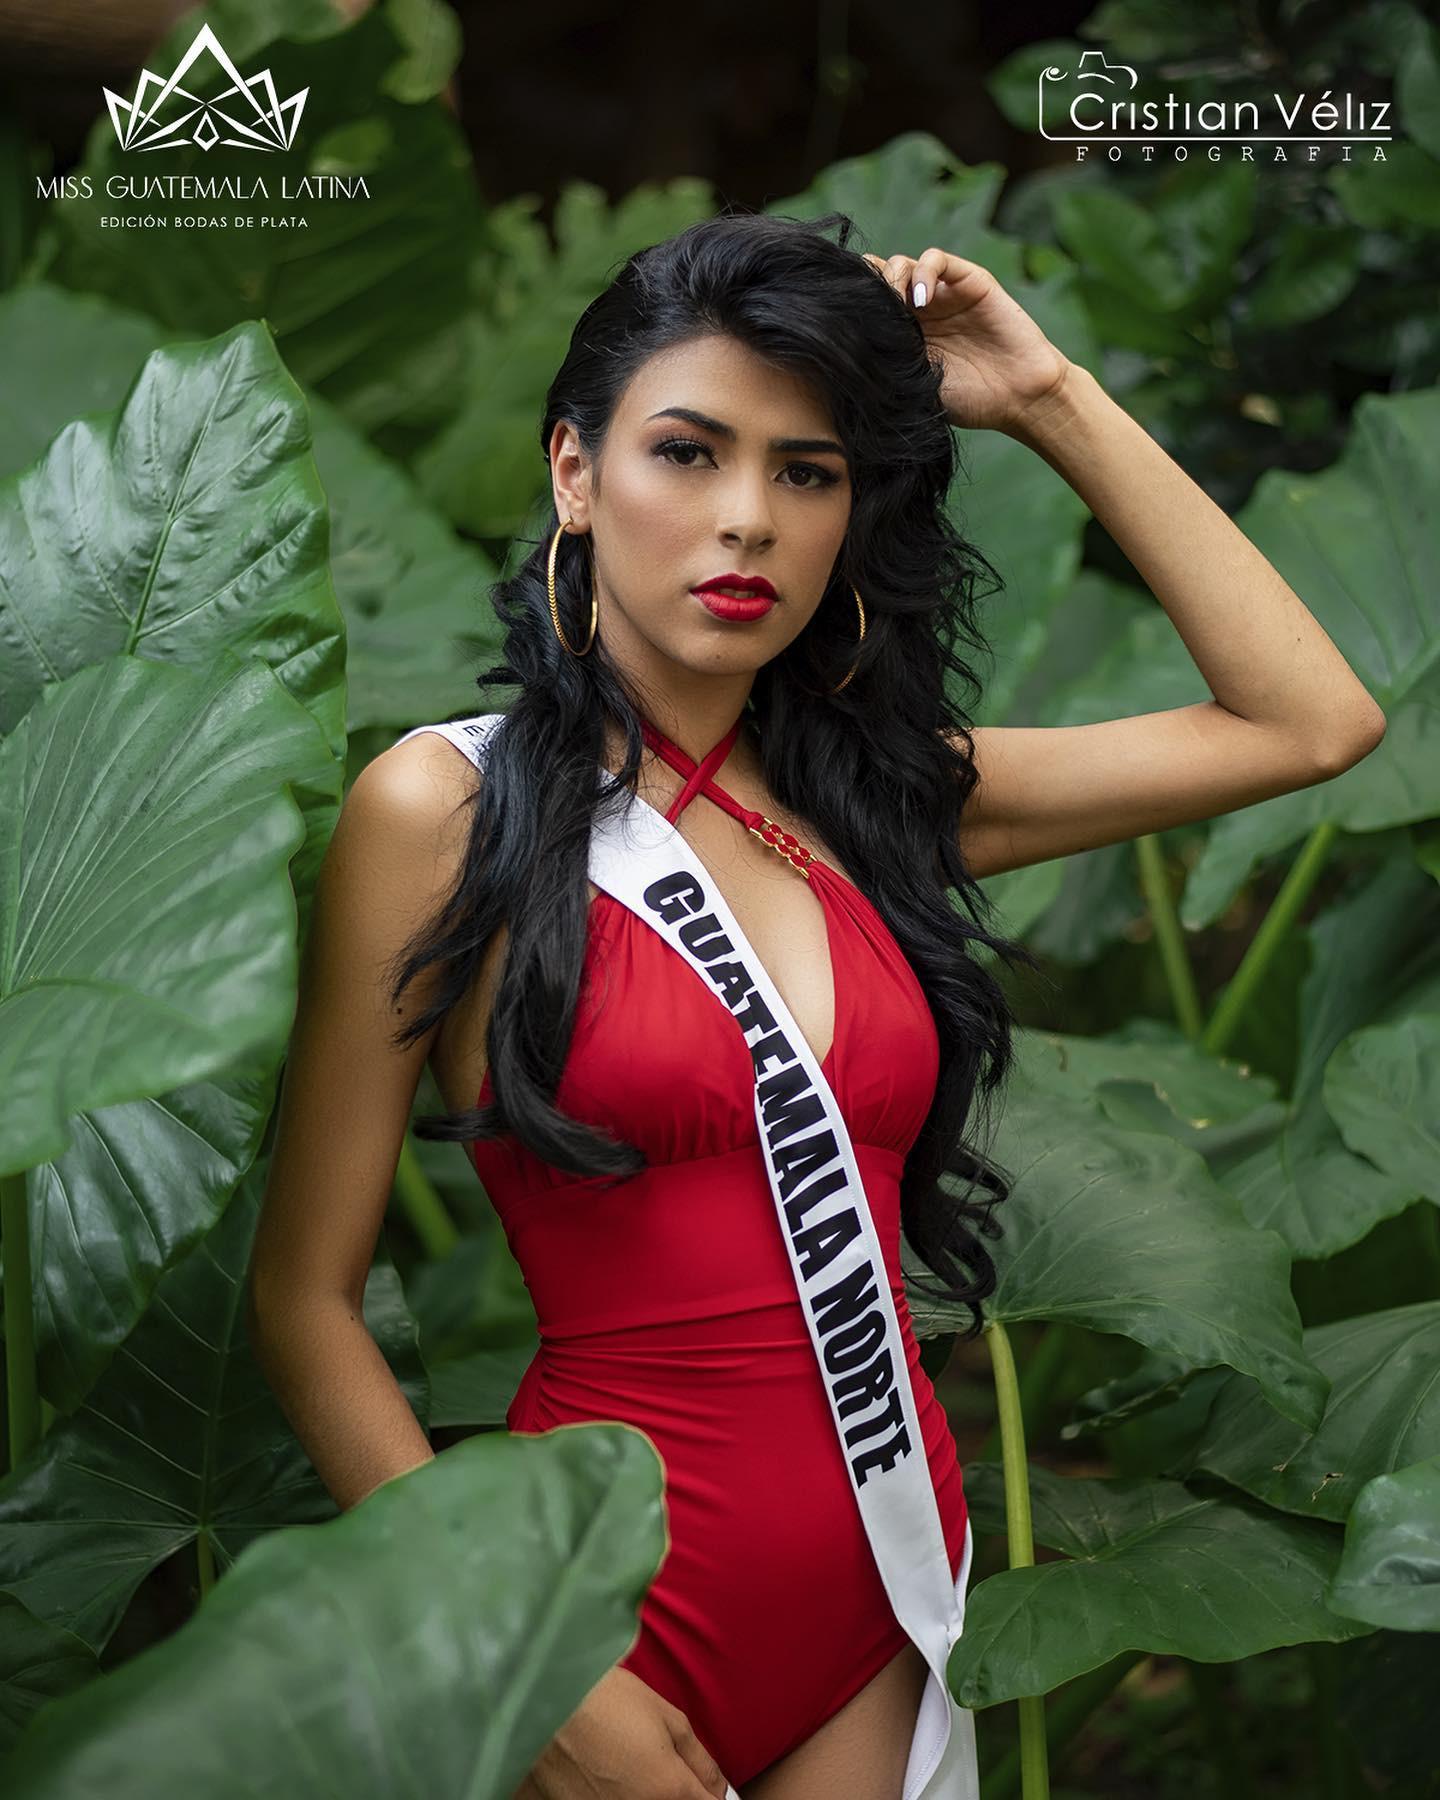 candidatas a miss guatemala latina 2021. final: 30 de abril. - Página 4 B3uJNs